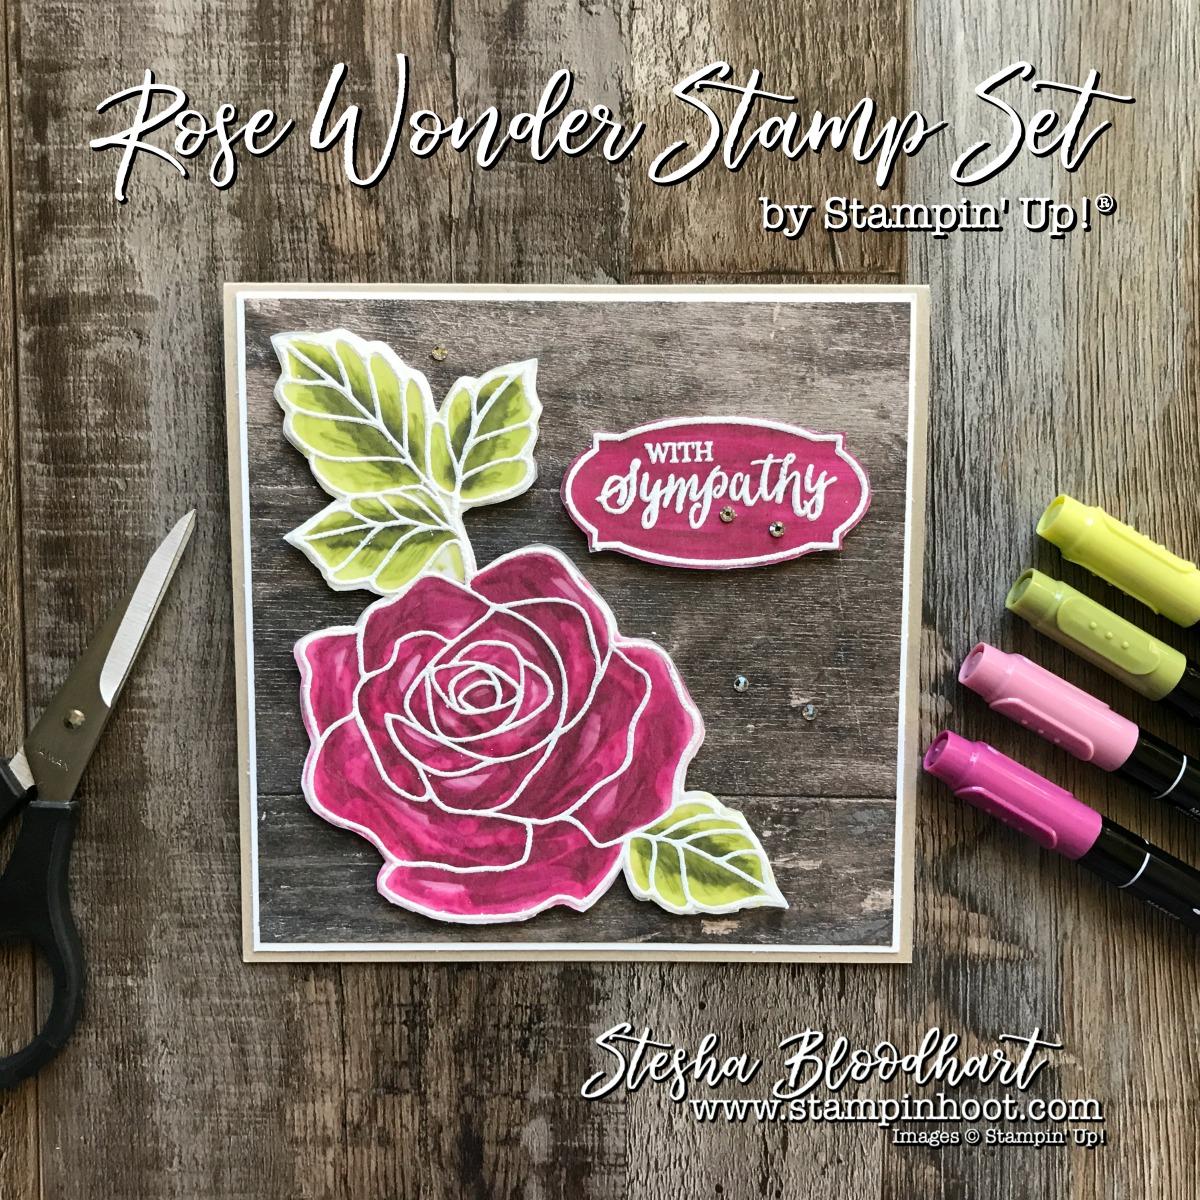 Rose Wonder Stamp Set by Stampin' Up! for Kylie's International Highlights Top Ten Winners Blog Hop - Sympathy Card #stampinup #rosewonder #bloghop #sympathycard #papercrafts #stamping #cardmaking